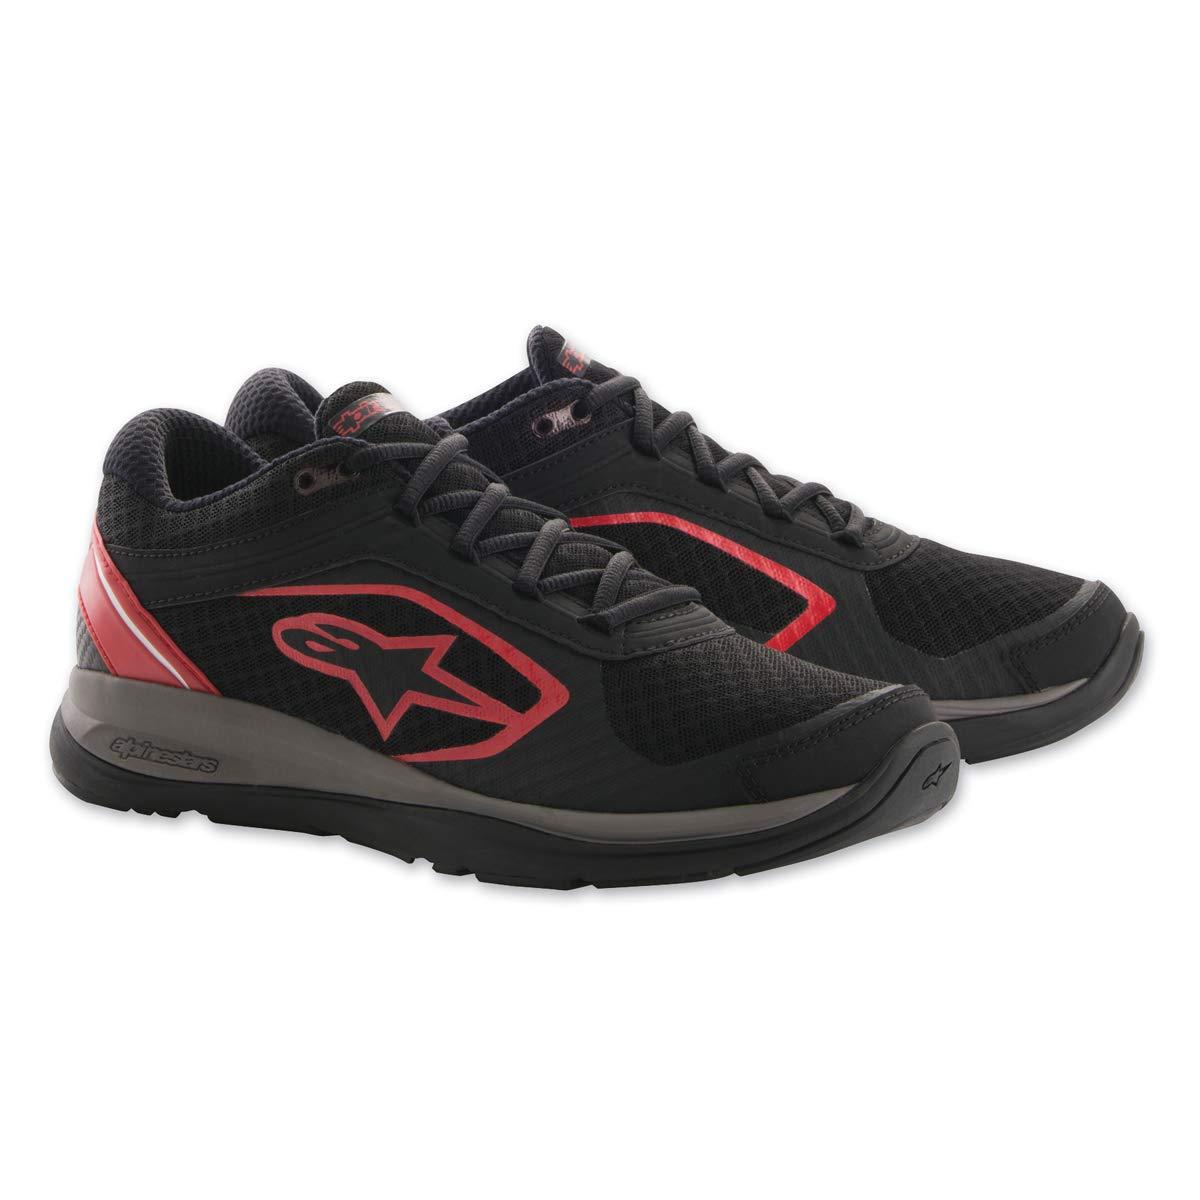 Alpinestars Men's 265401813-11 Shoe (Black/Red, Size 11)